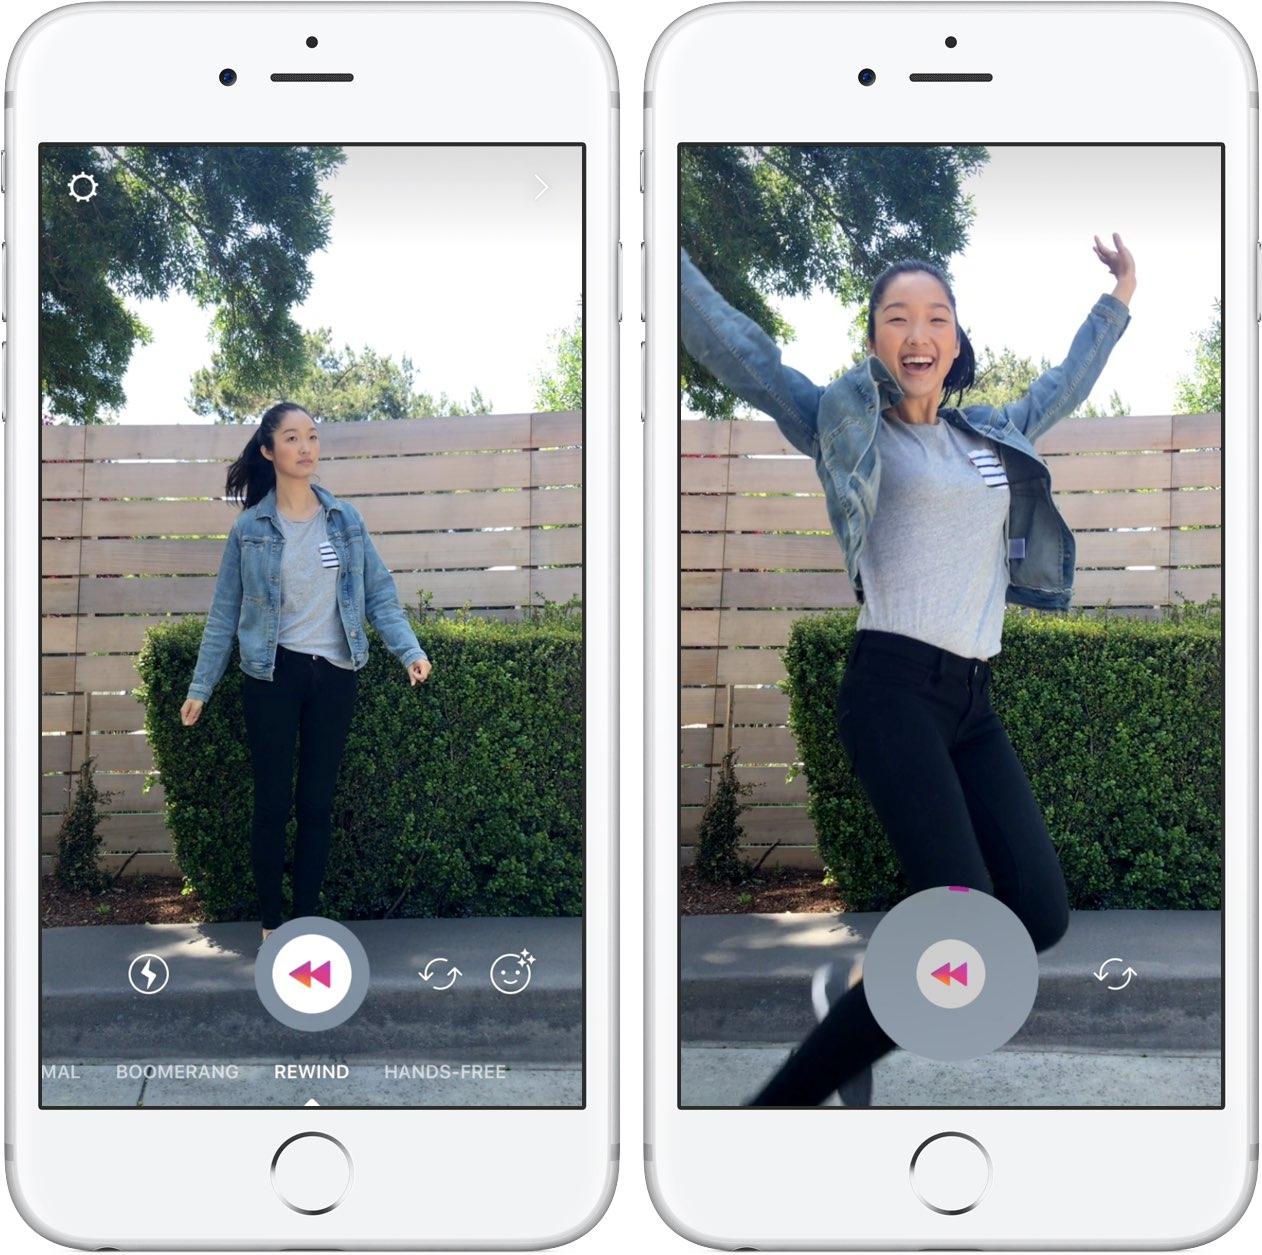 instagram-feature-rewind-video